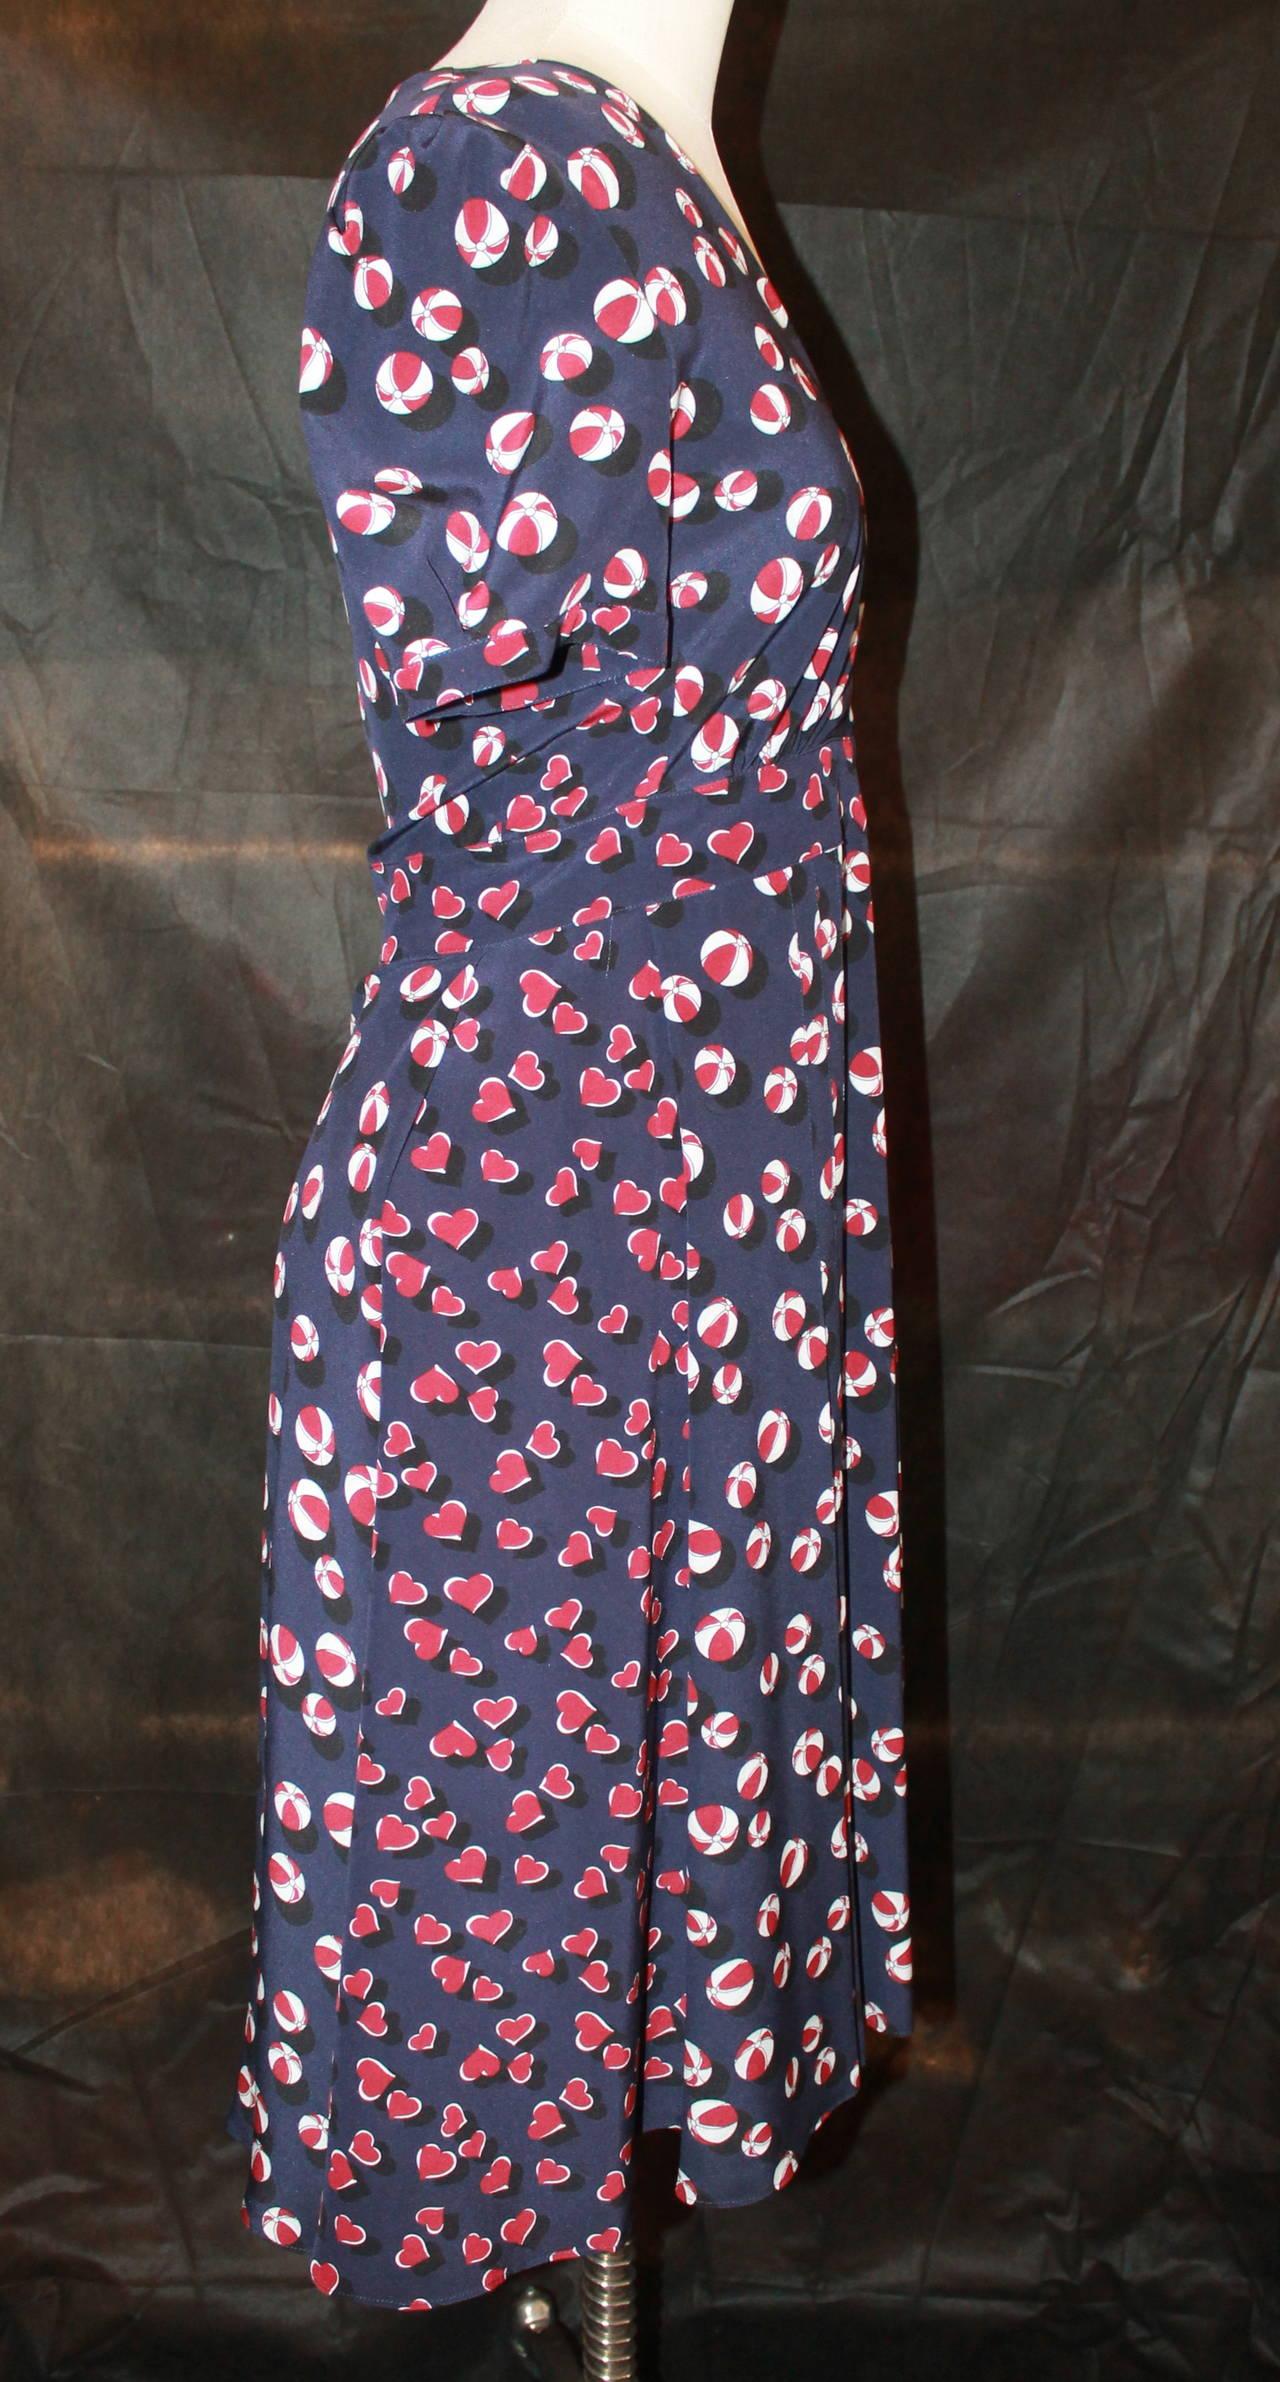 c7ba47ad5ad Gucci Navy Silk Beach Ball & Hearts Print Sleeve Dress - 40. This dress is